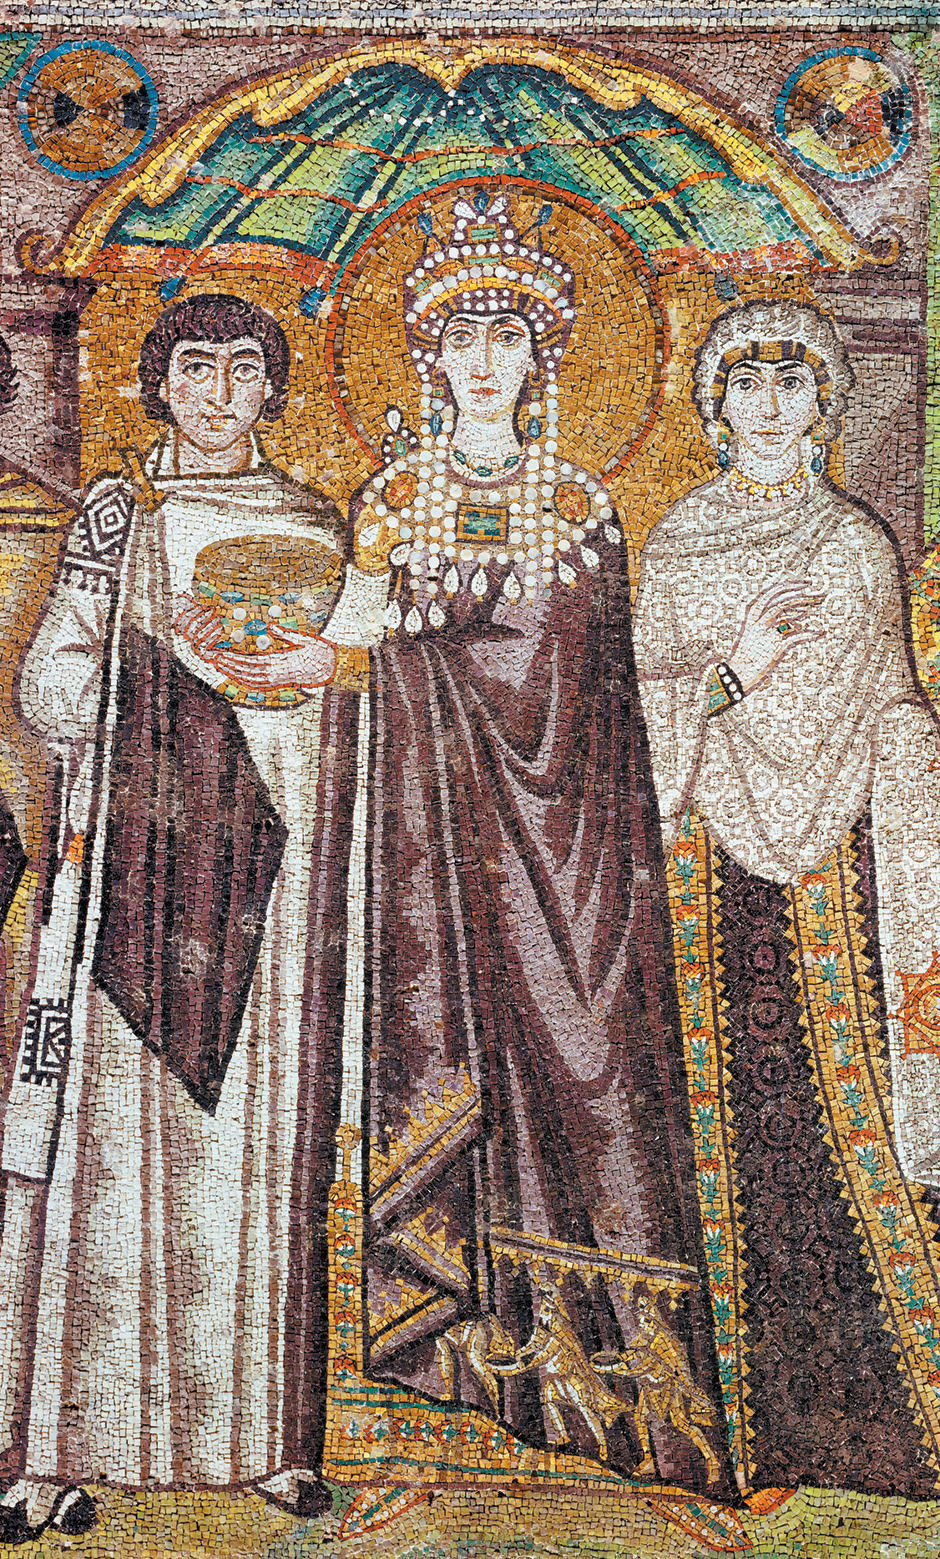 Empress Theodora; mosaic from the Basilica of San Vitale, Ravenna, Italy, sixth century